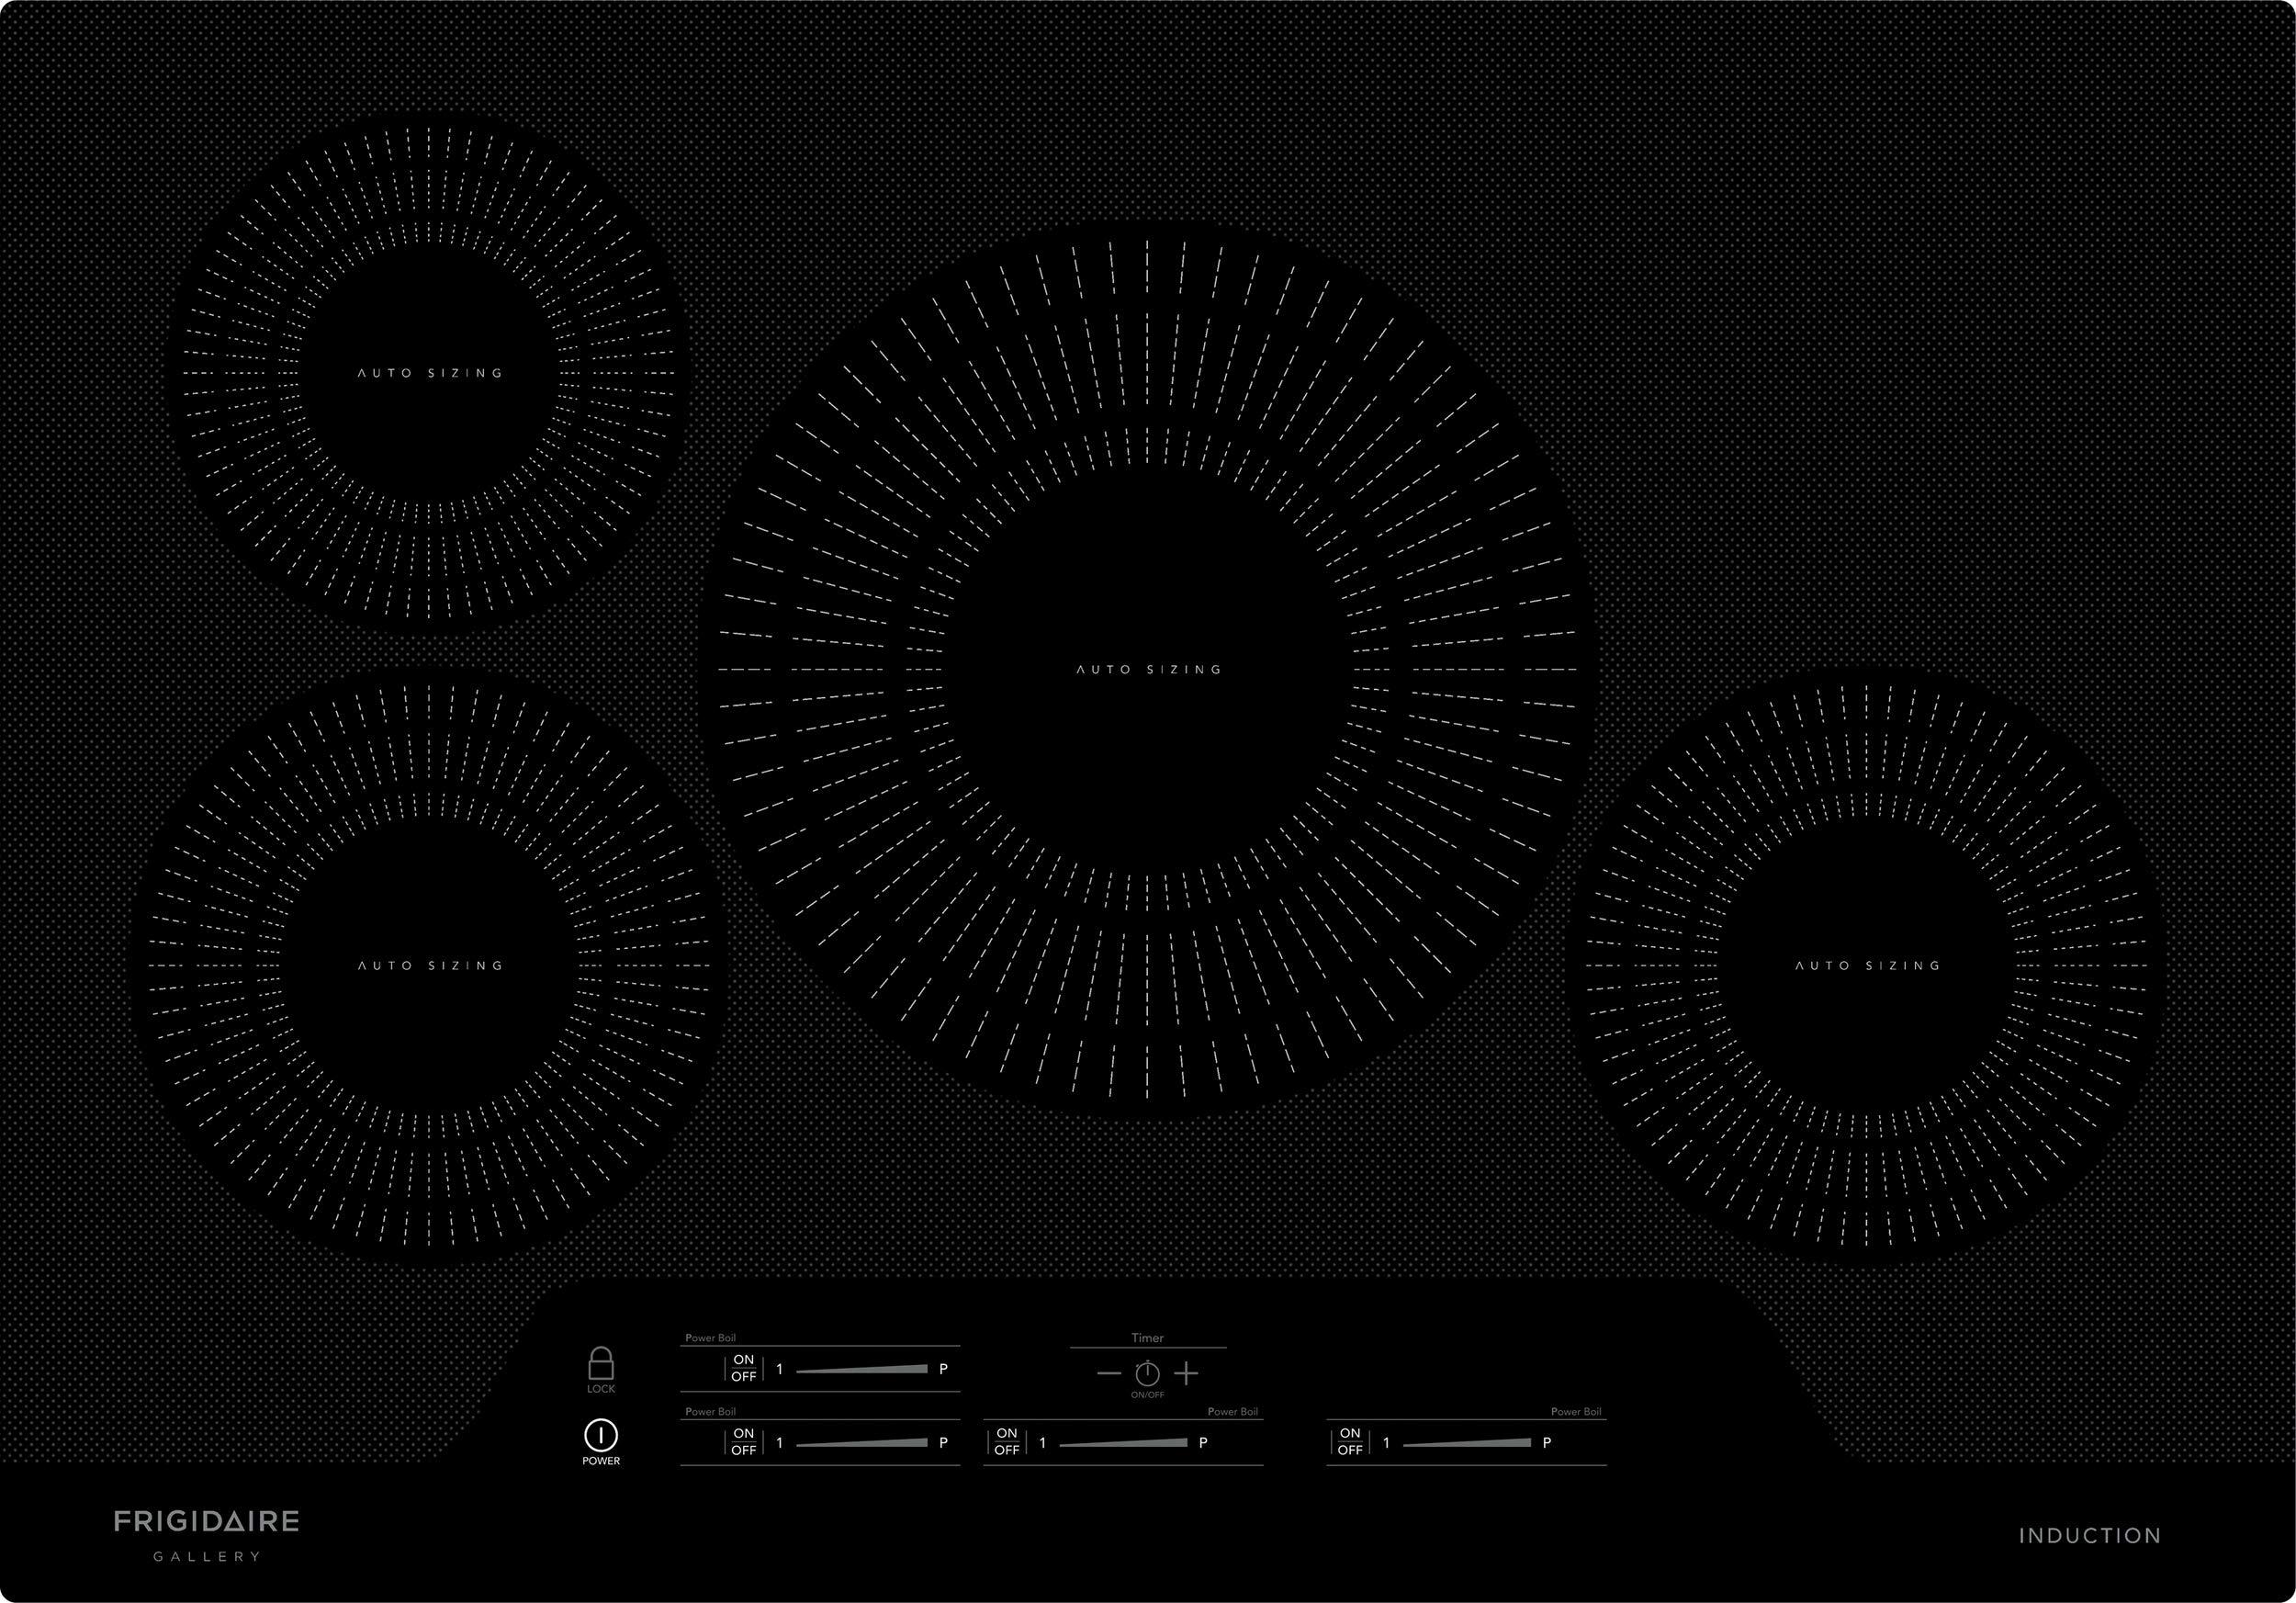 "Frigidaire FGIC3066TB Gallery 30"" Electric Induction Cooktop, Built-in 4-Burner, Vitroceramic Glass, Black"